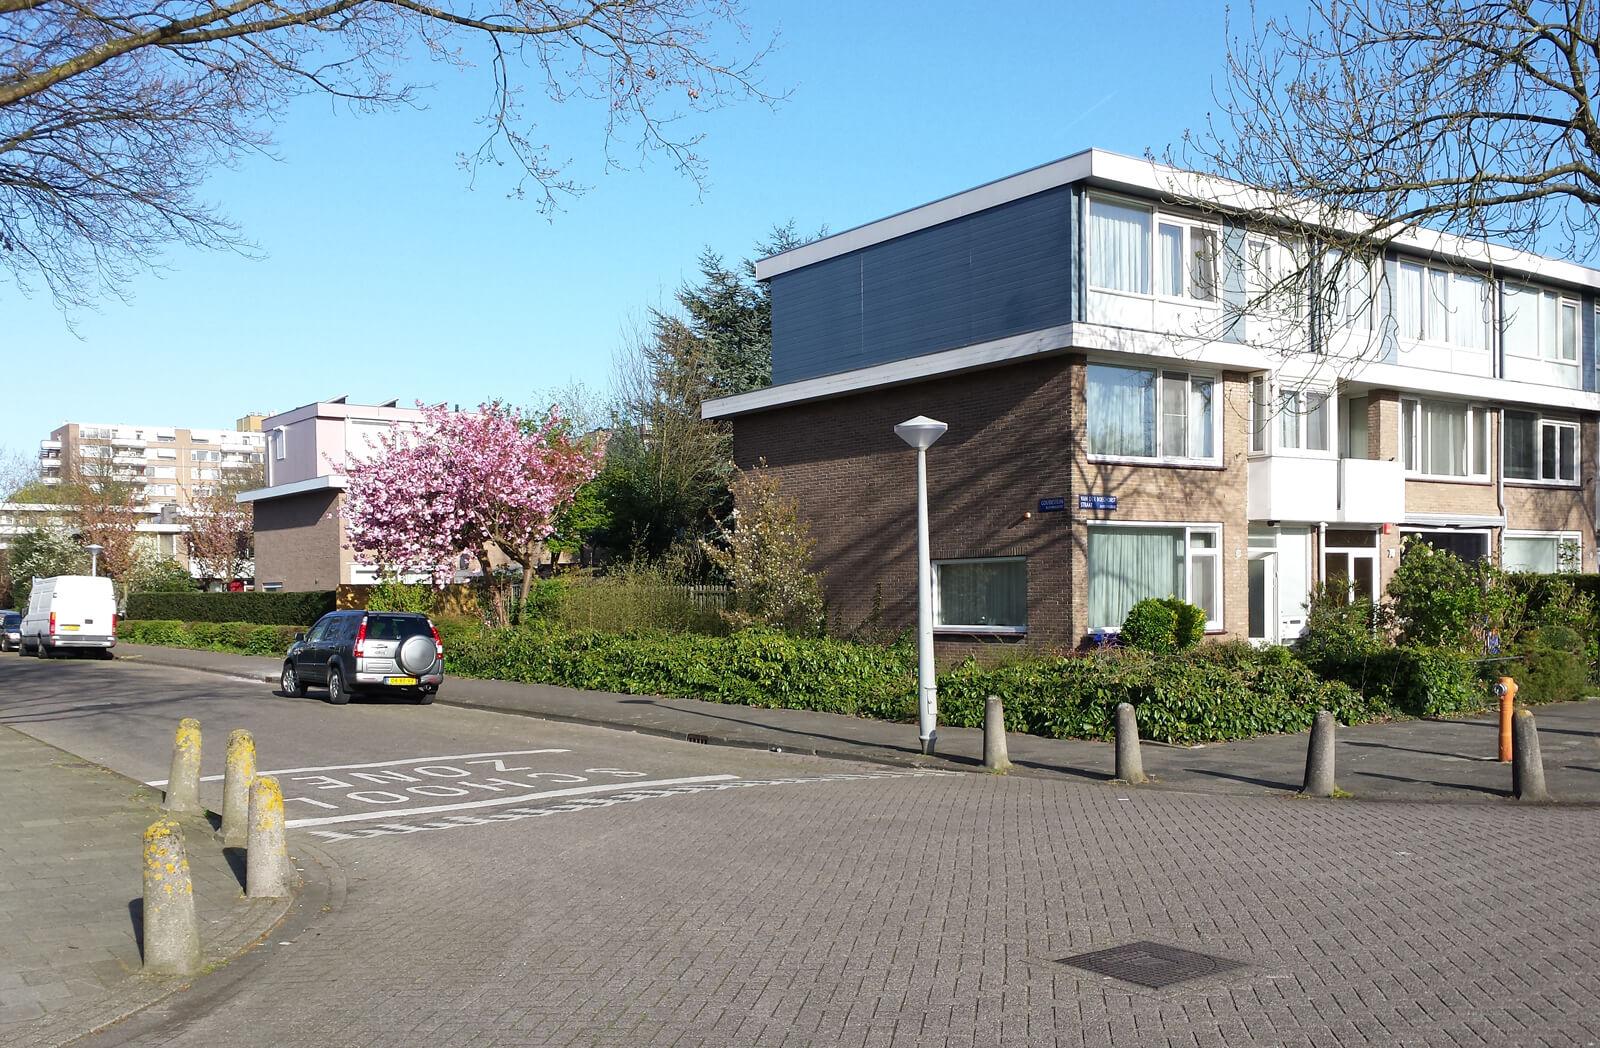 Район Buitenveldert, Амстердам